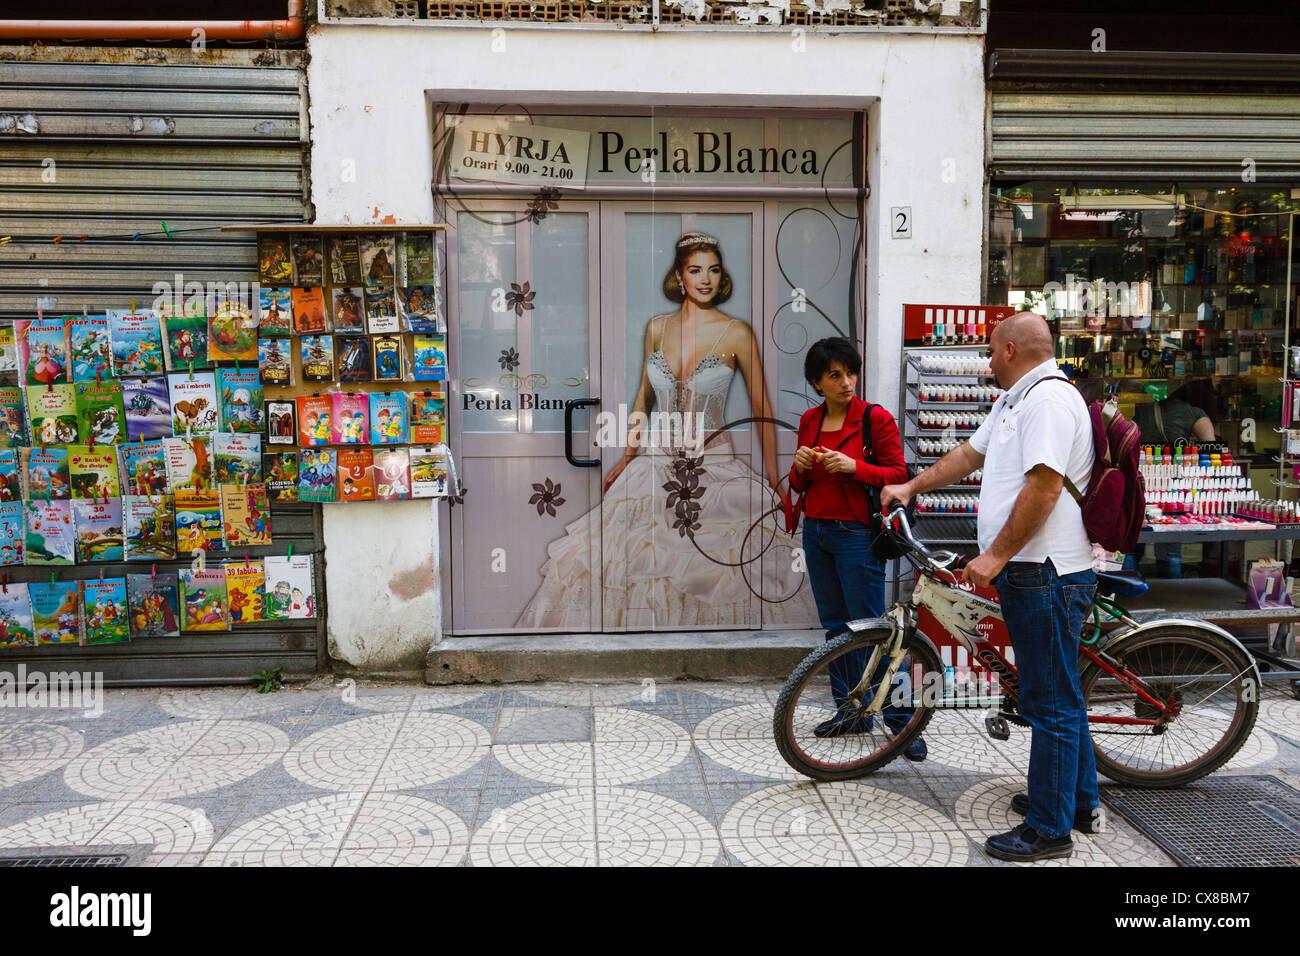 Street scene in downtown Tirana, Albania Stock Photo